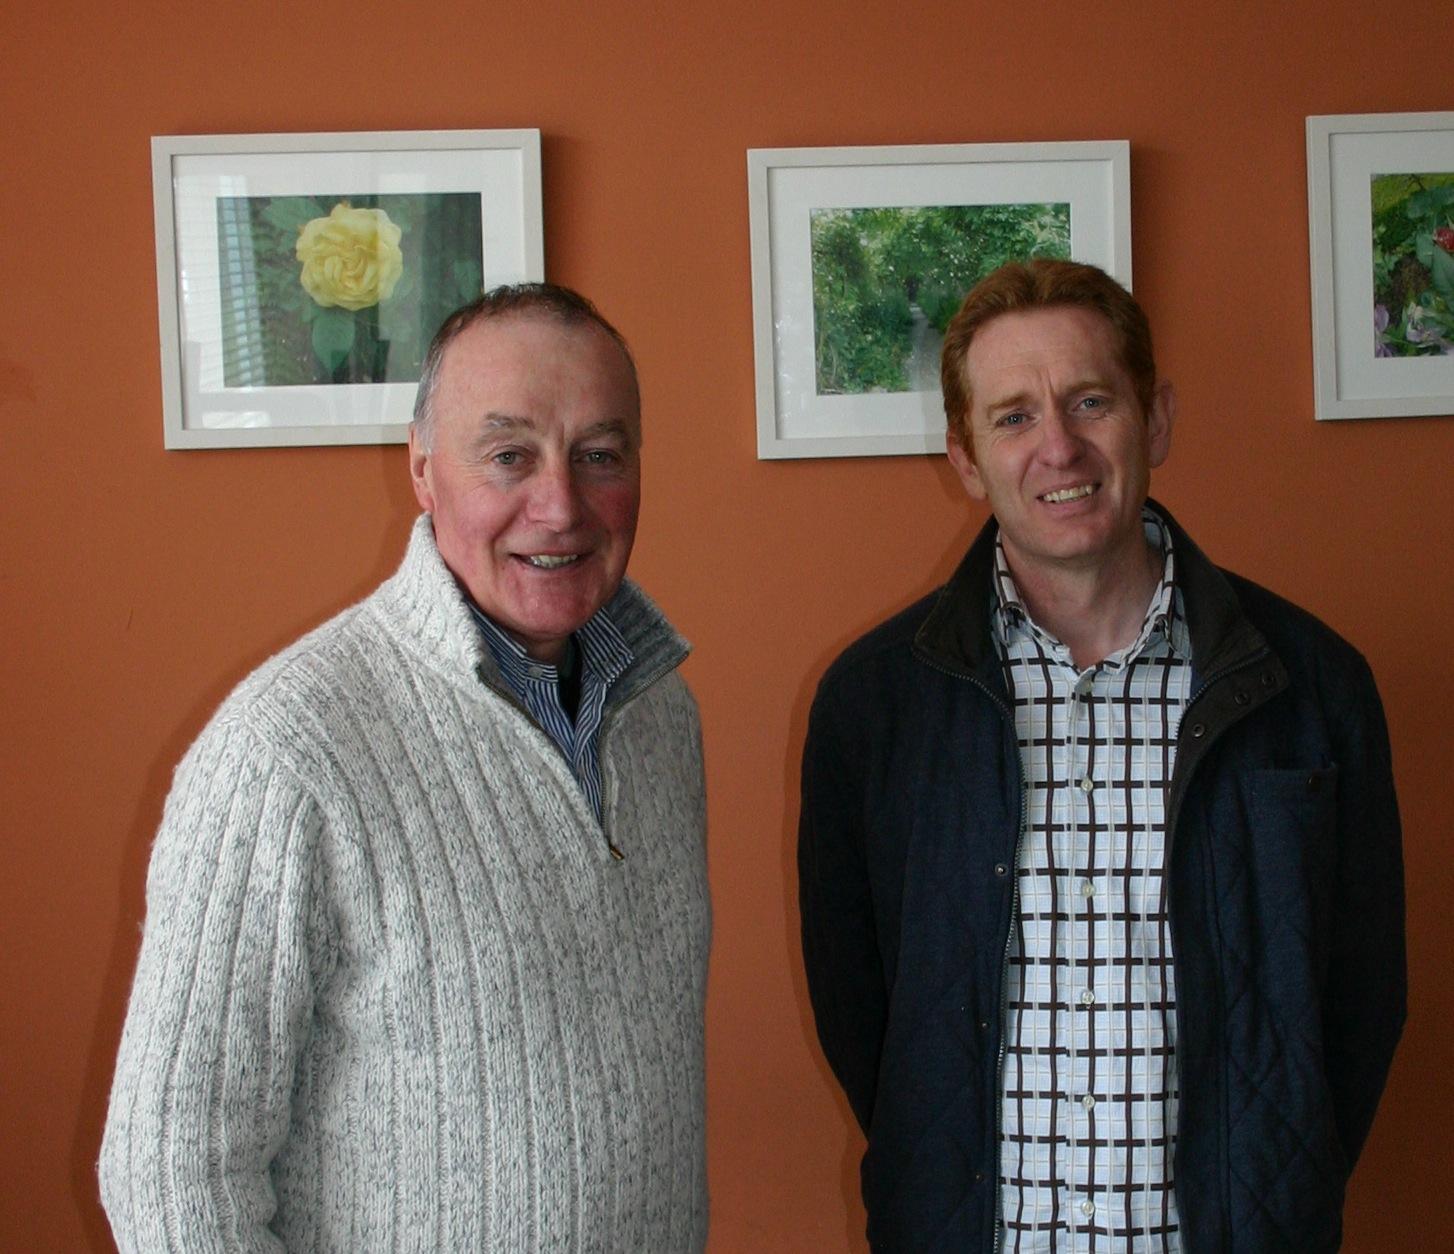 John and Andy who lead Kilkenny Community Church